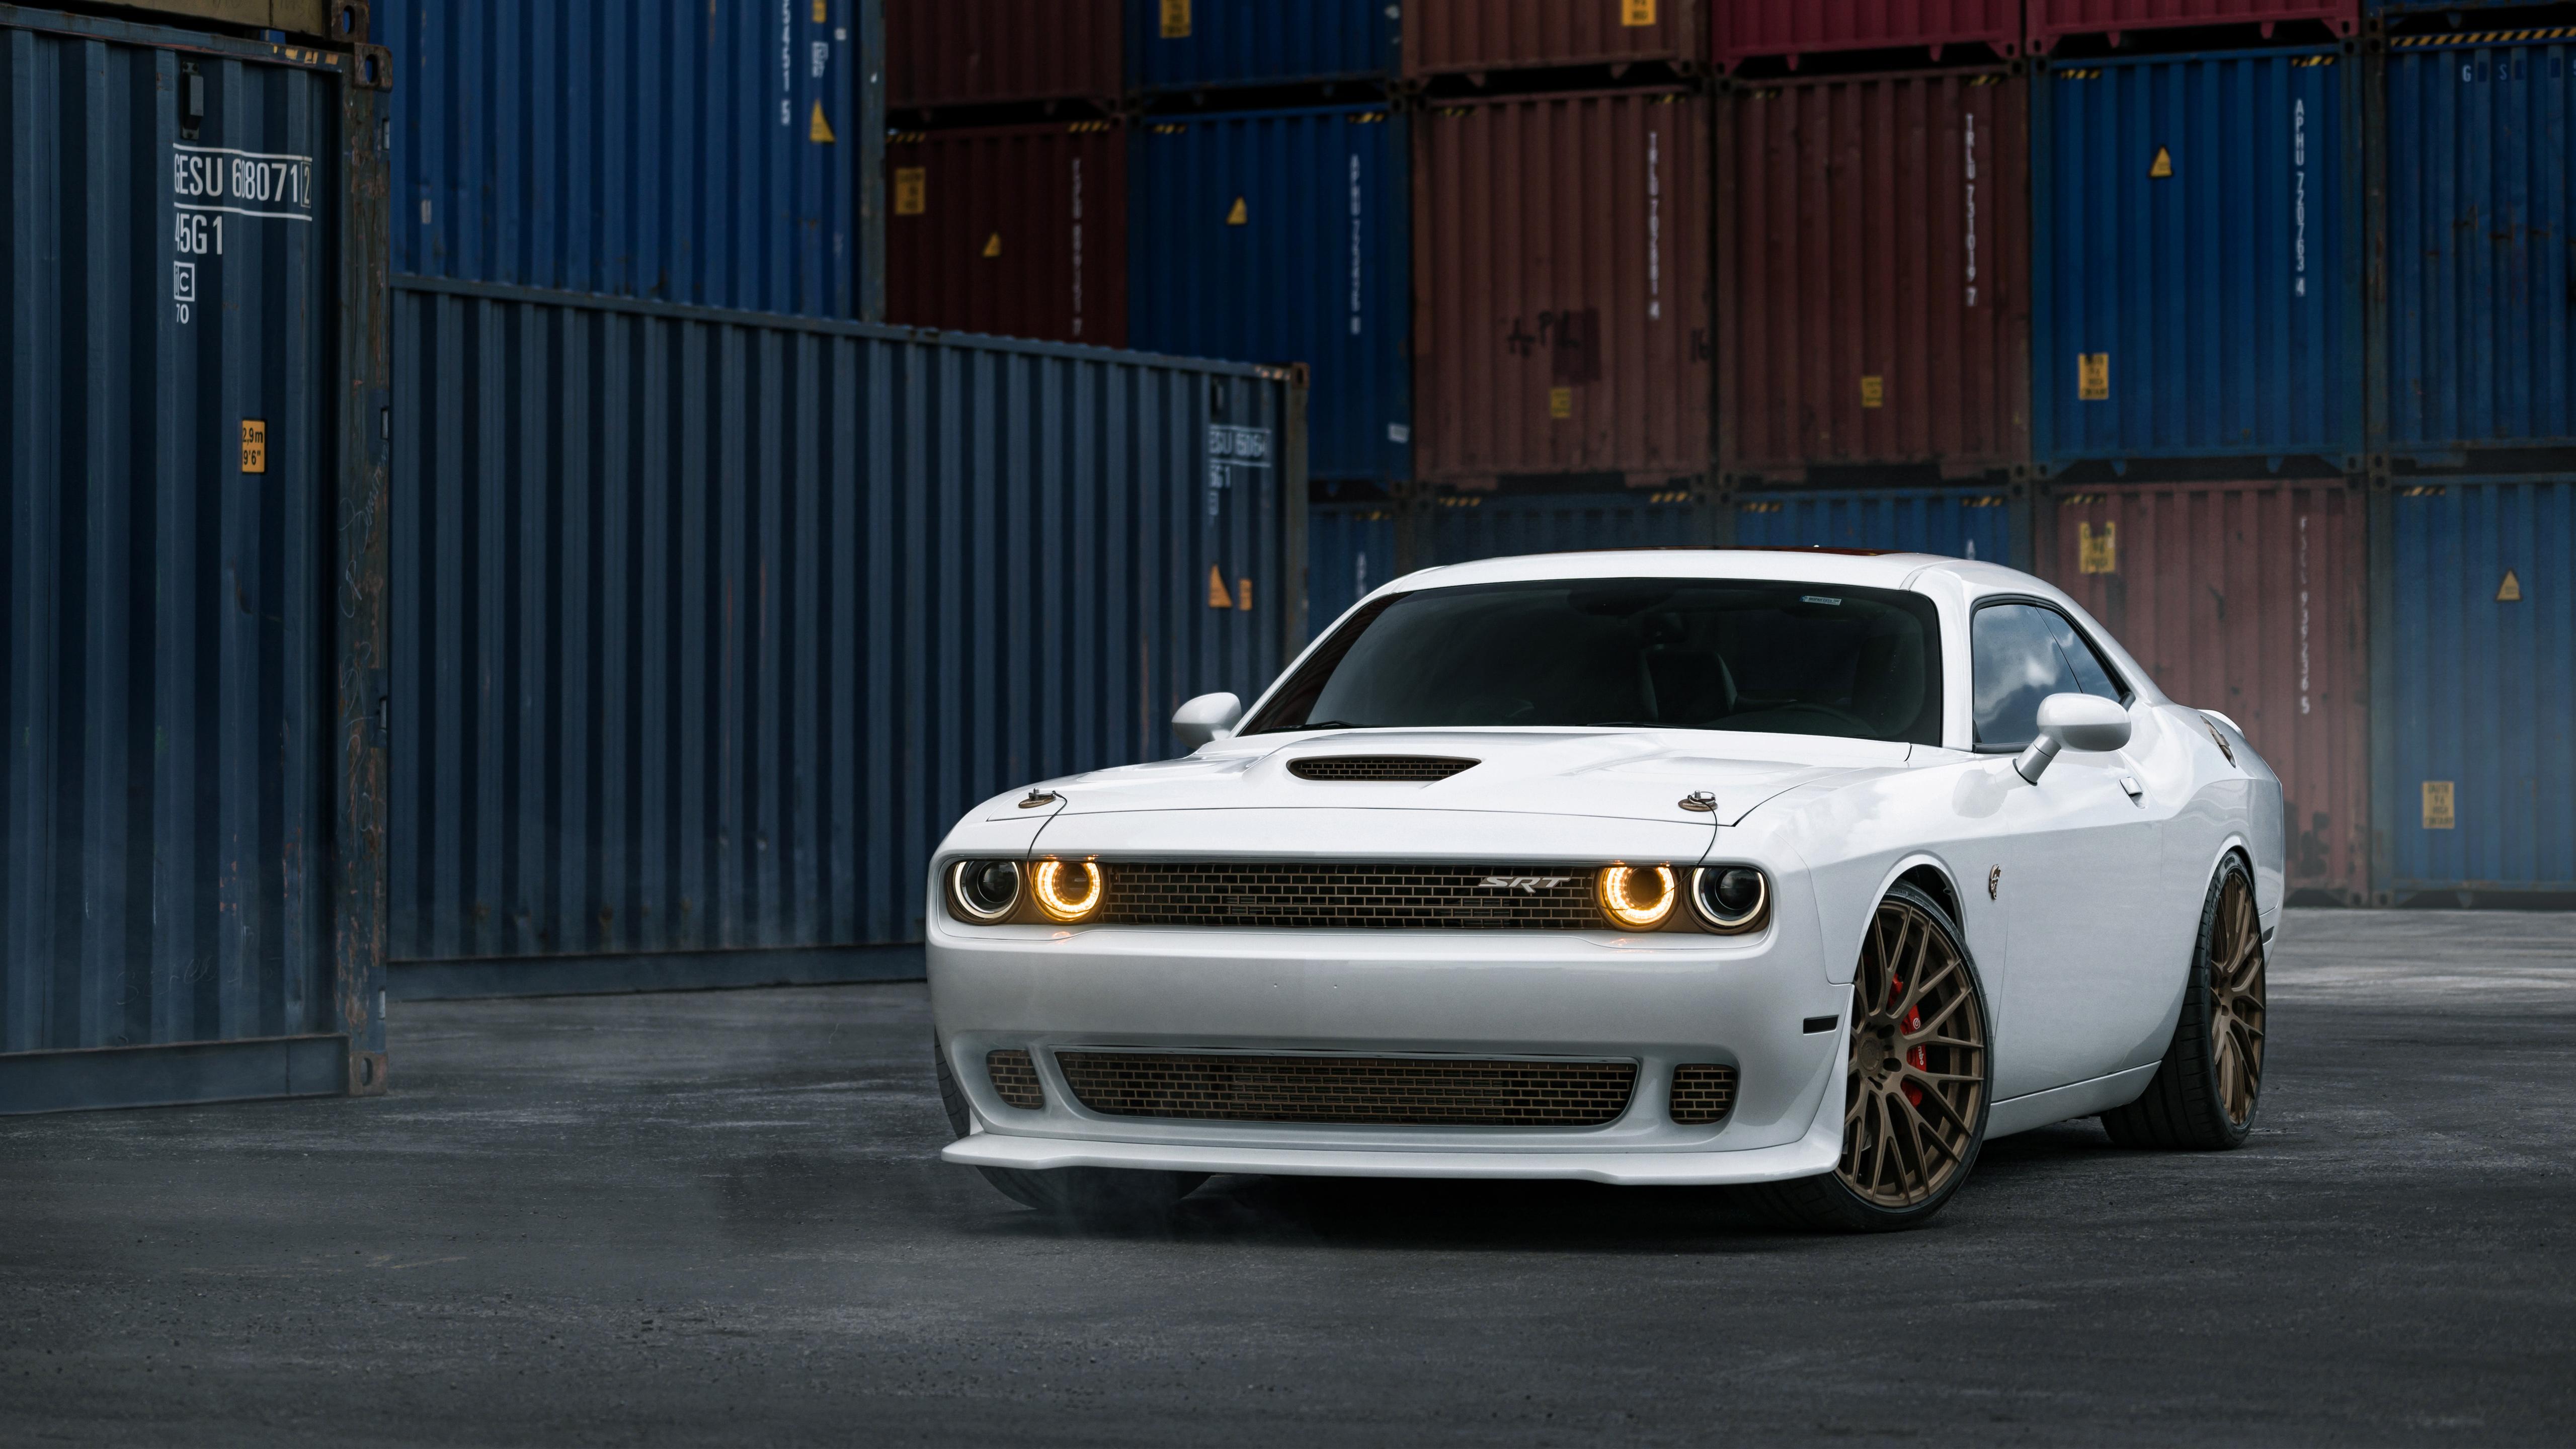 Dodge Challenger Srt Hellcat White Wallpaper Hd Car Wallpapers